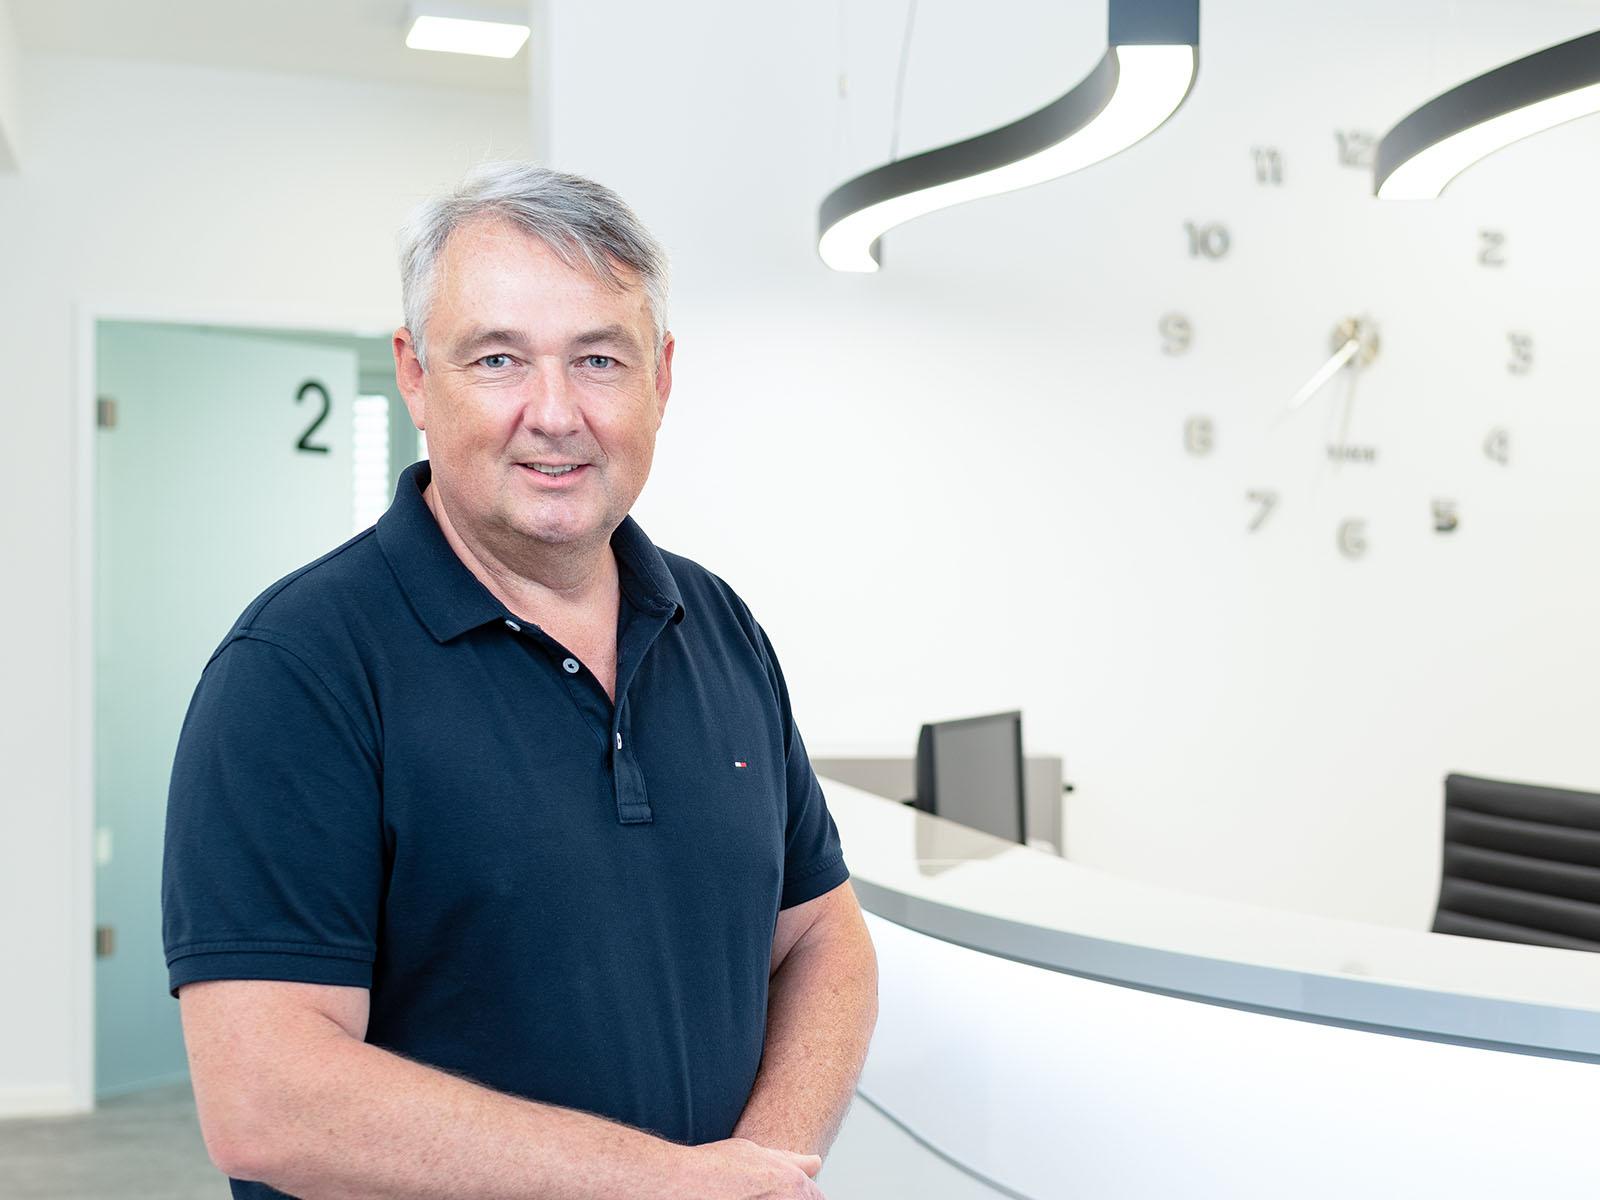 Zahnarzt Dr. Andreas Makowski